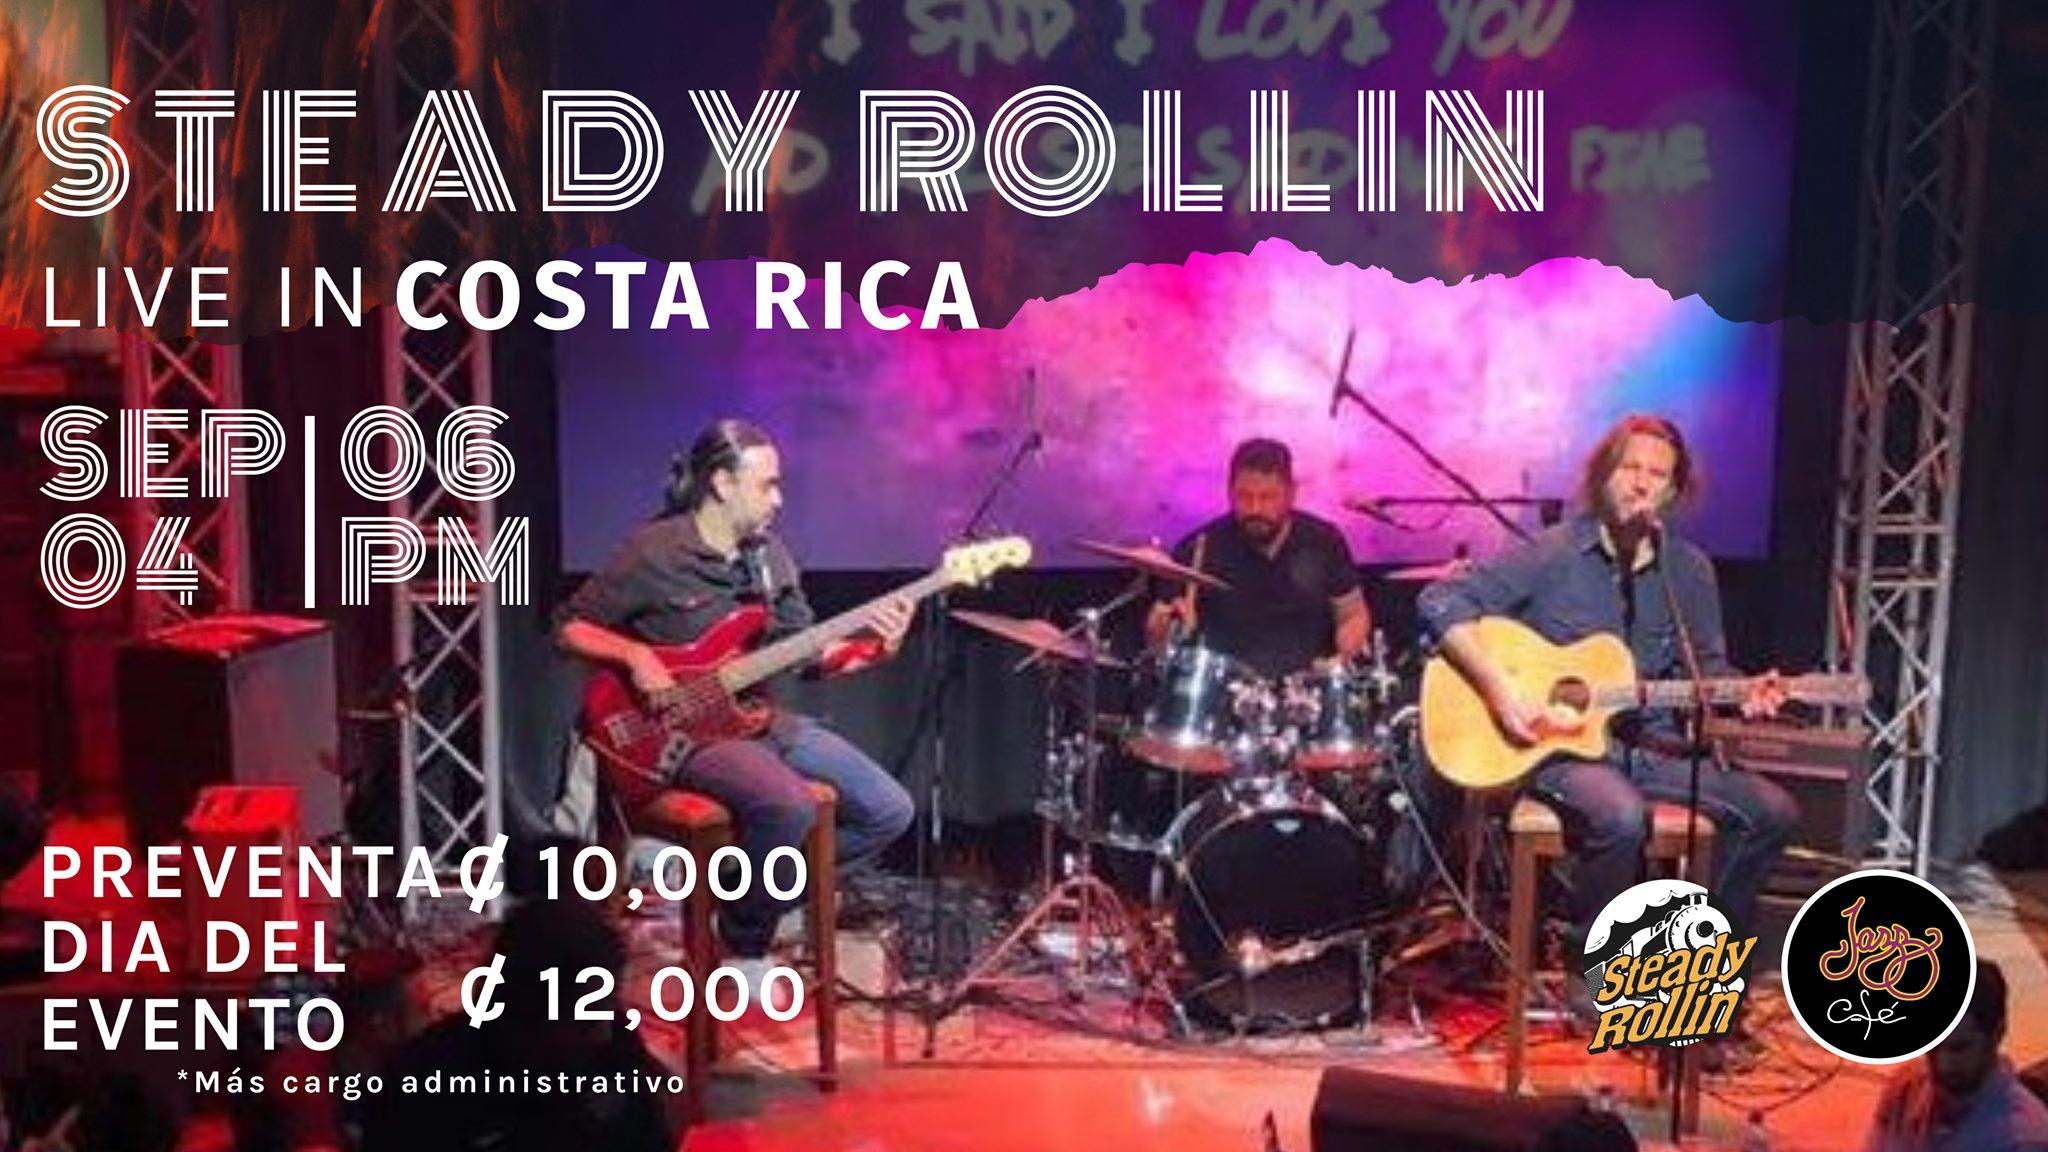 Steady Rollin Live in Jazz Café - Costa Rica